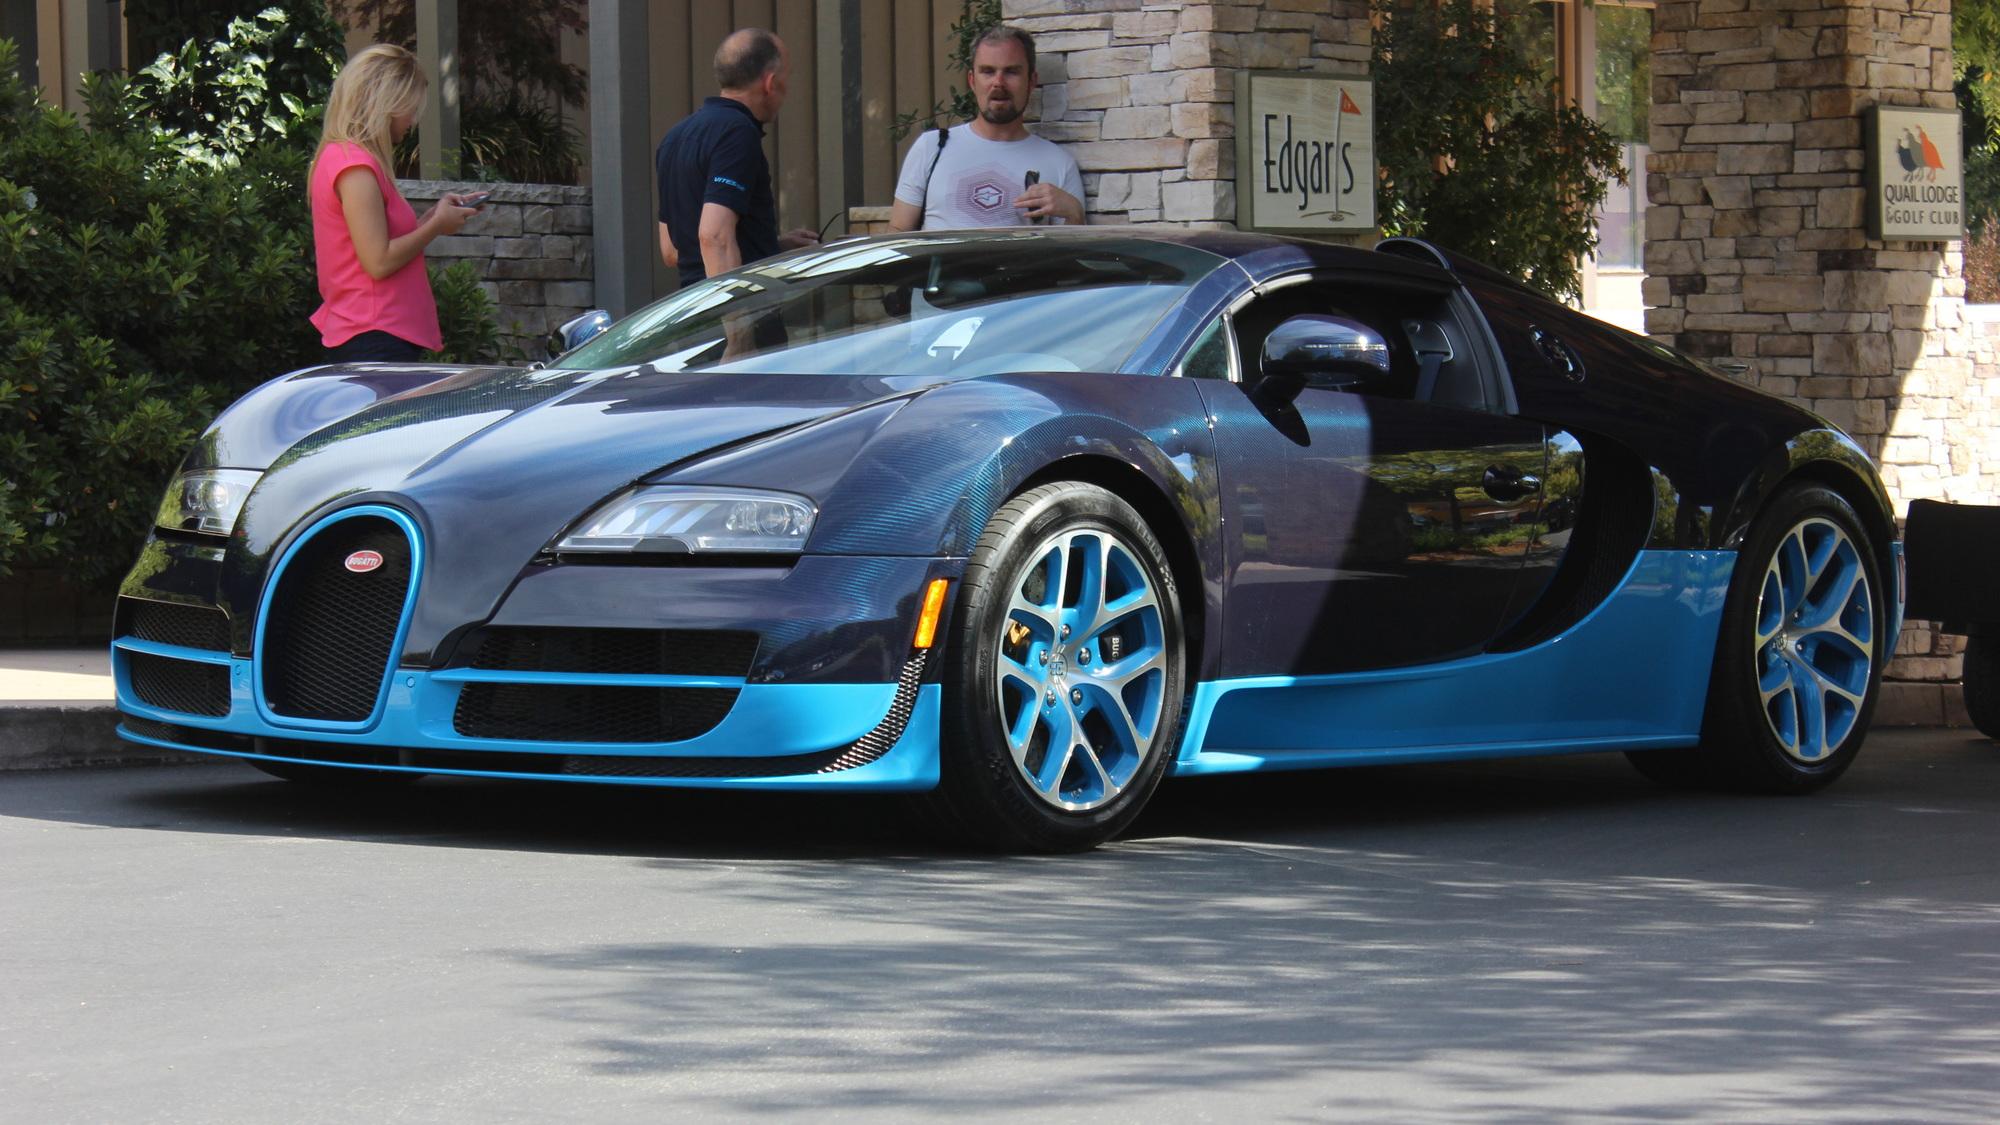 Bugatti Veyron Grand Sport Vitesse - Image via Manuel Carrillo III